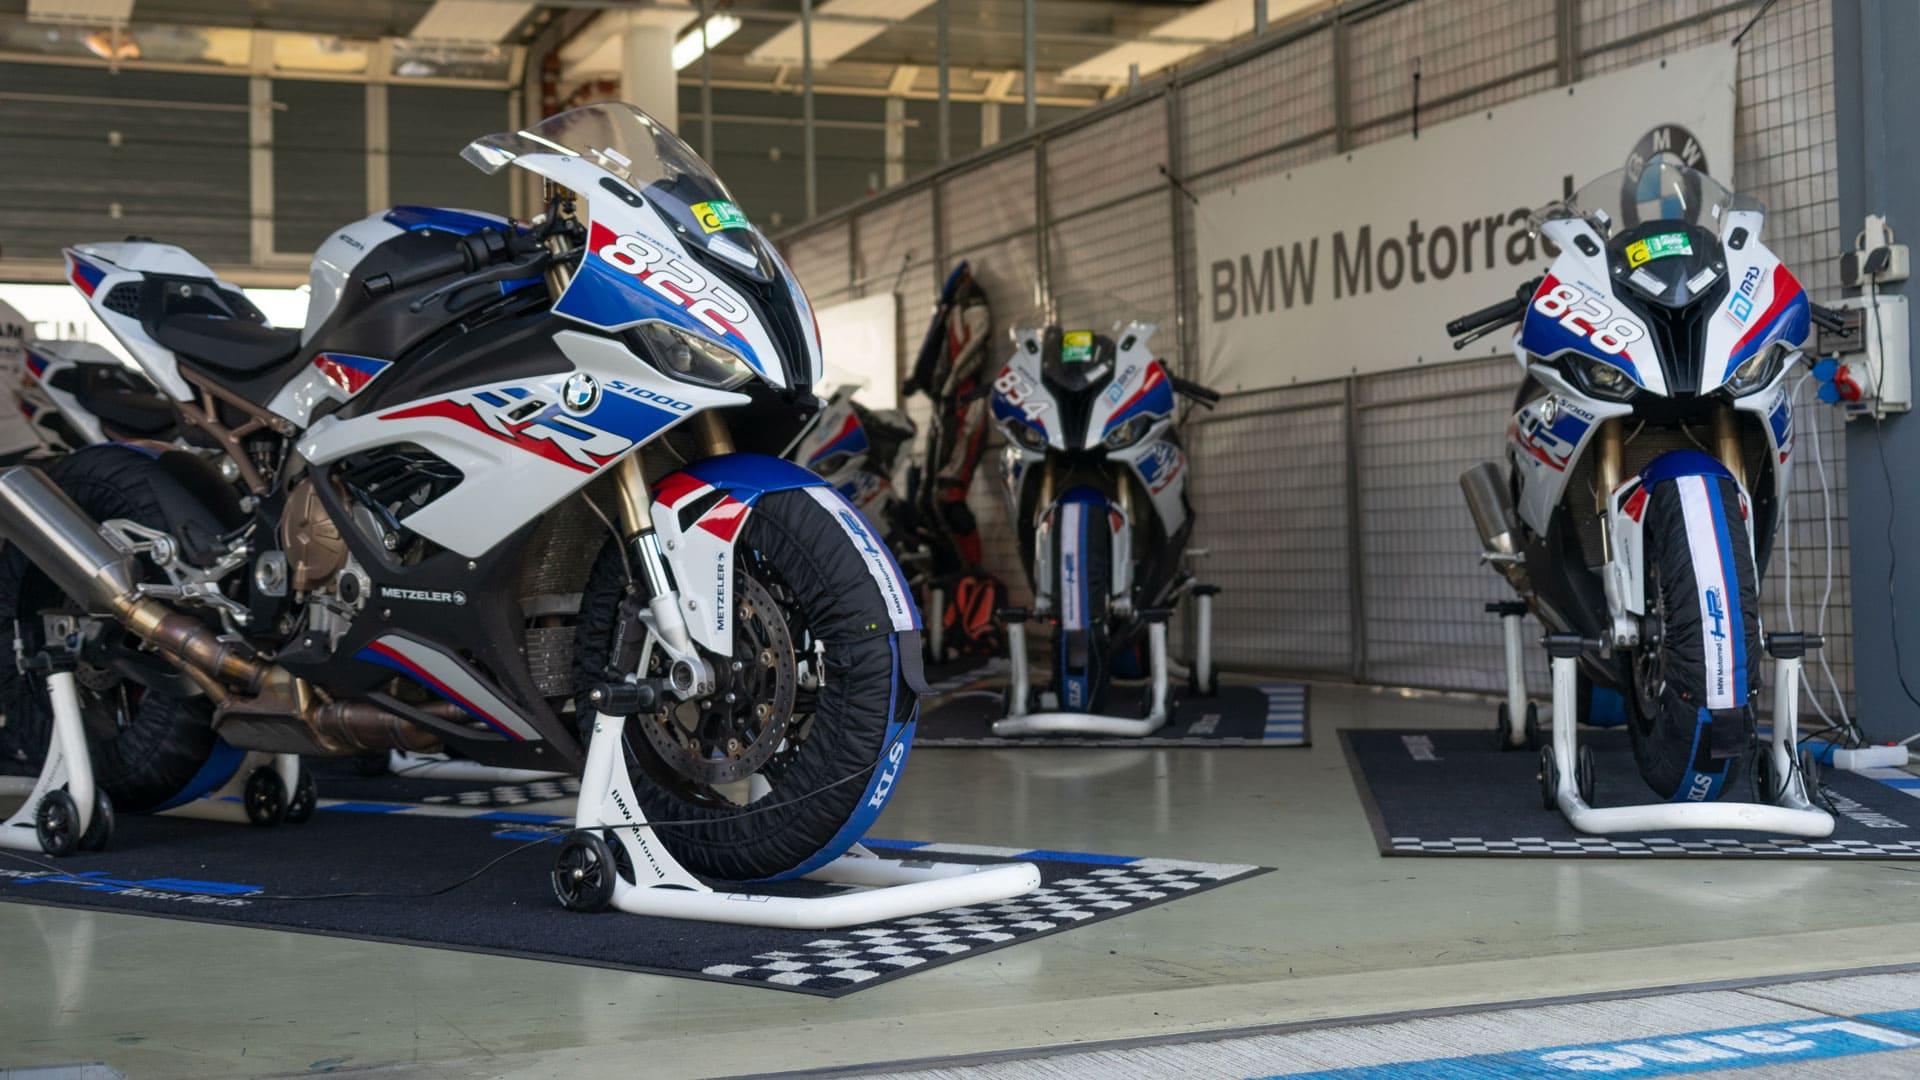 Moto RacingSchool Motorrad